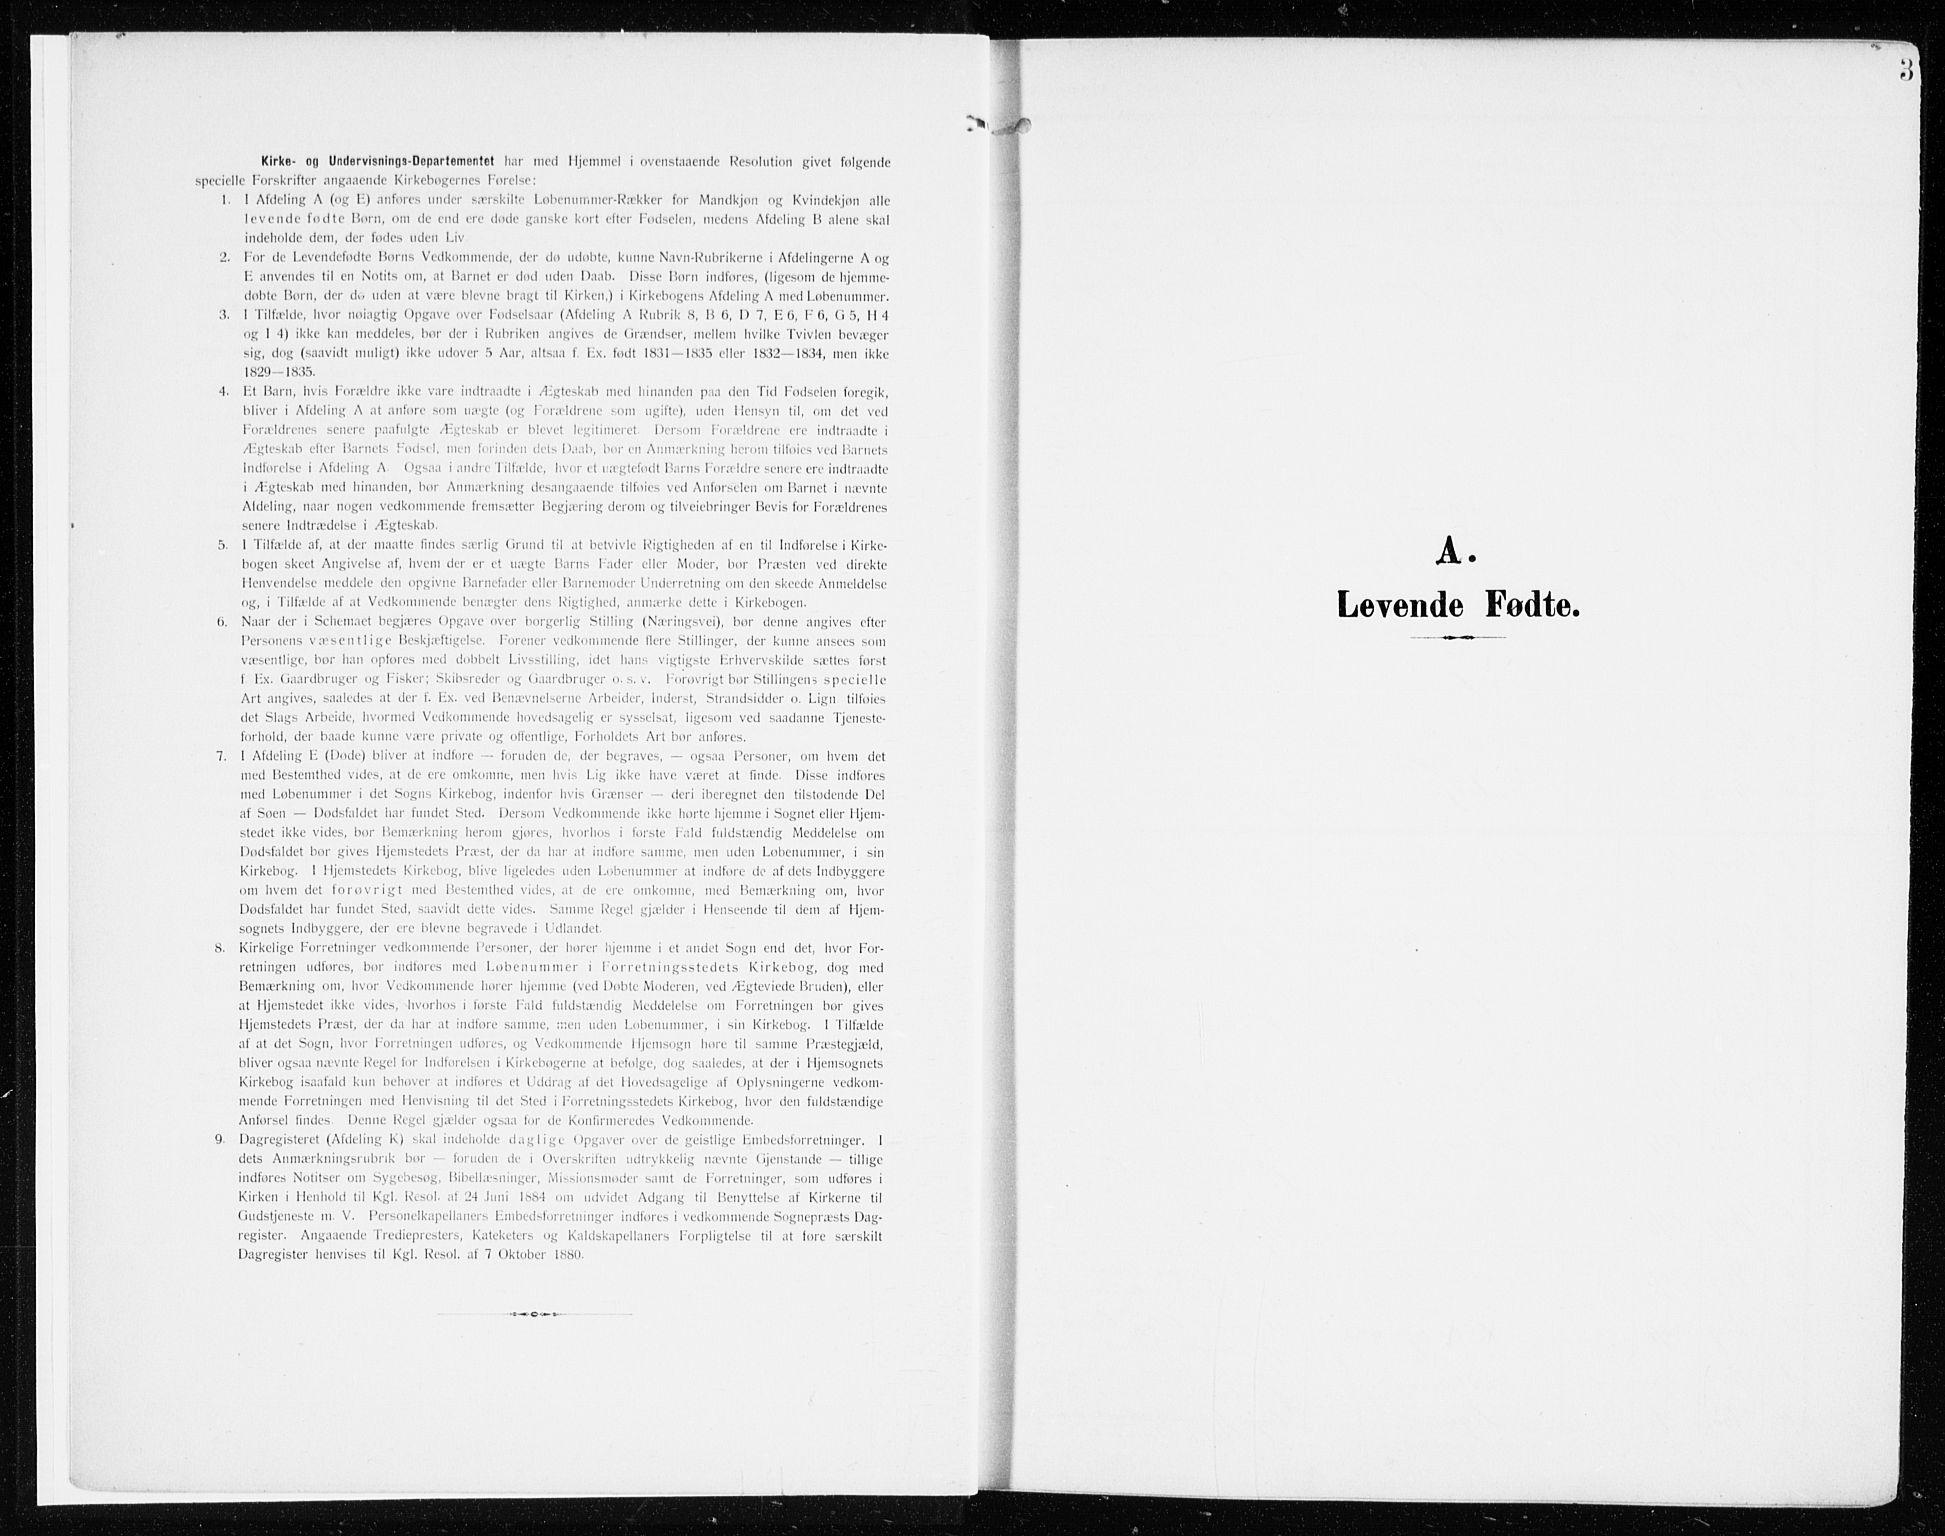 SAH, Løten prestekontor, K/Ka/L0011: Ministerialbok nr. 11, 1908-1917, s. 3